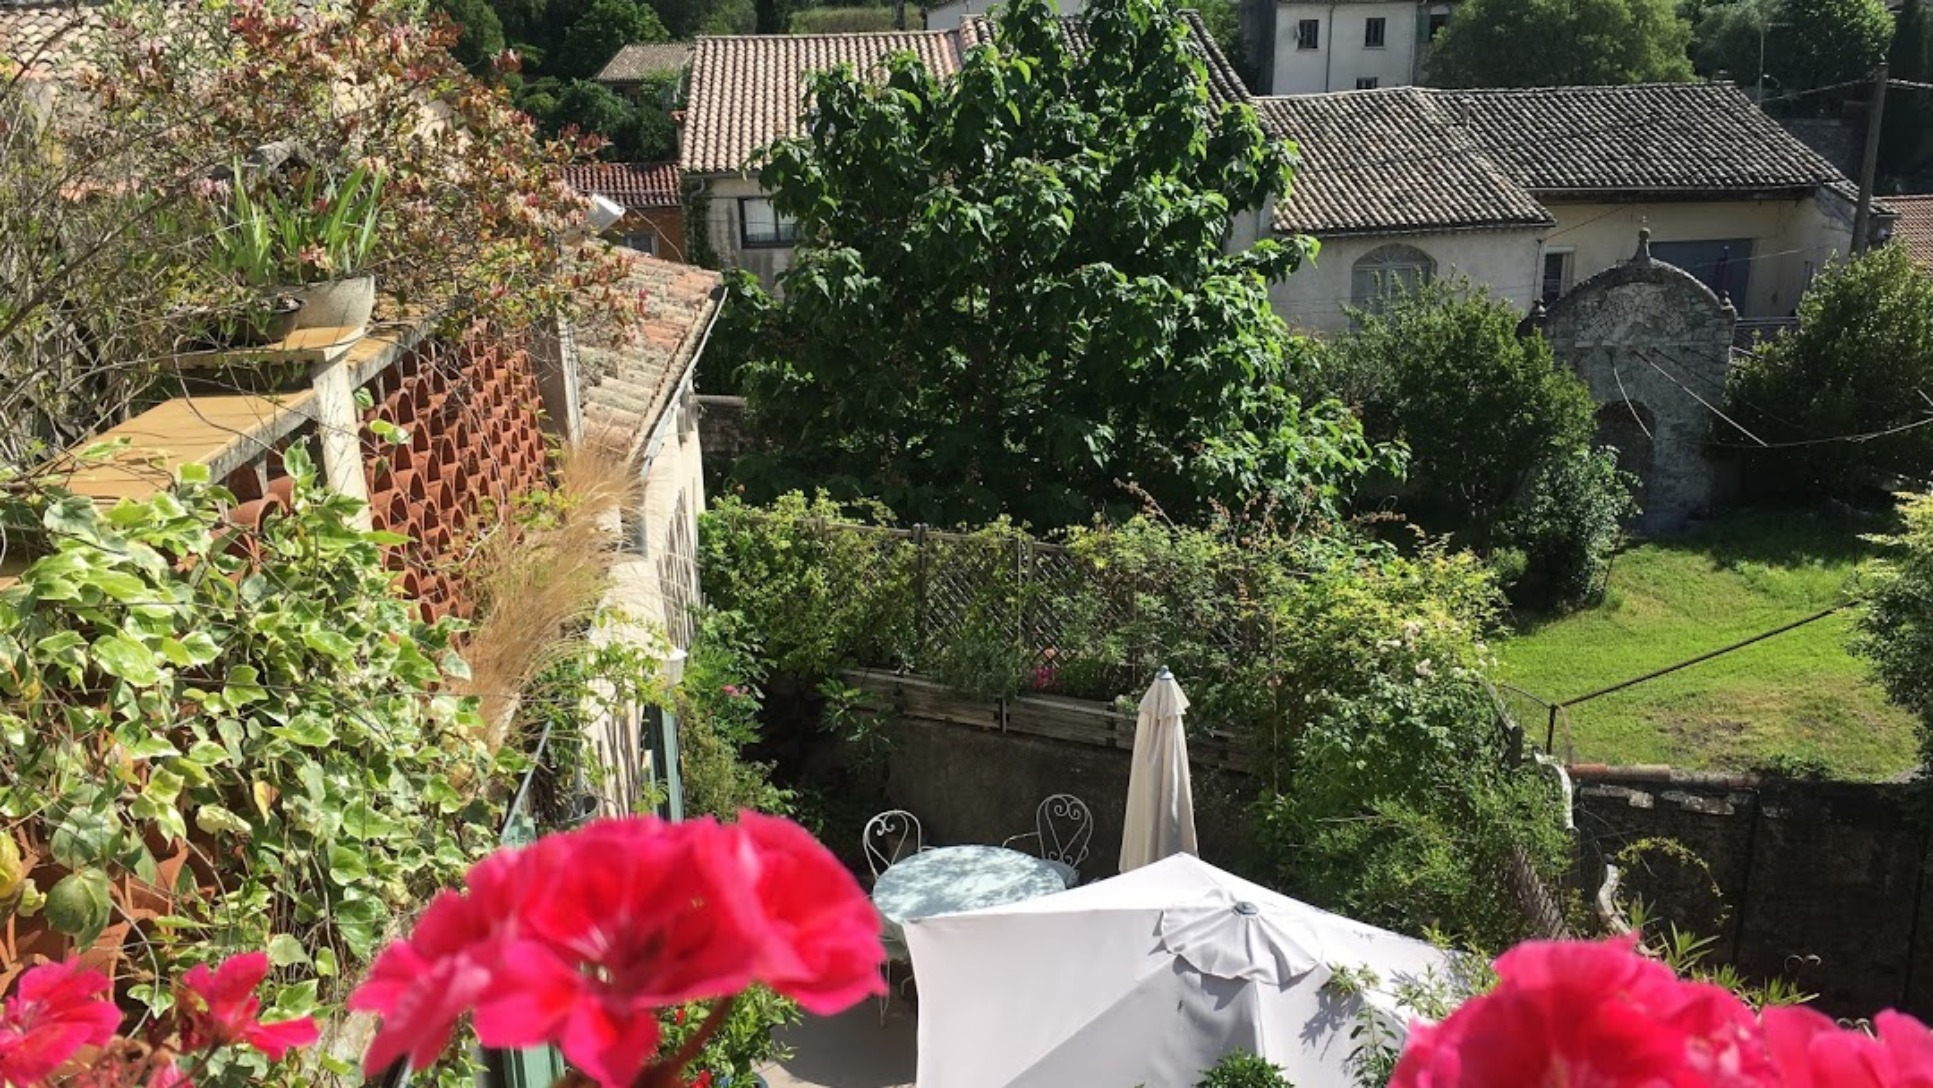 A close up of a flower garden at La Longère Luxury B&B.